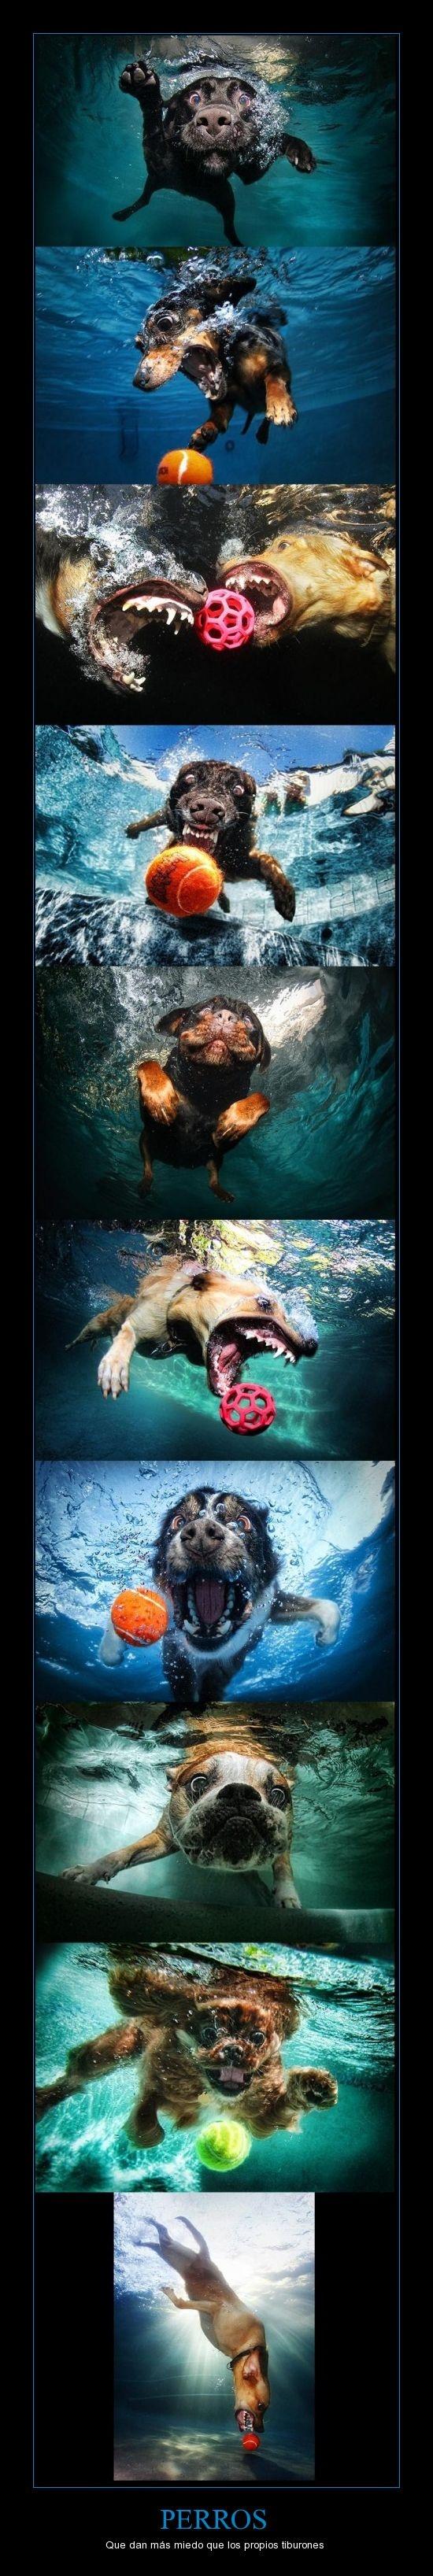 #Perros submarinos - Underwater #dogs